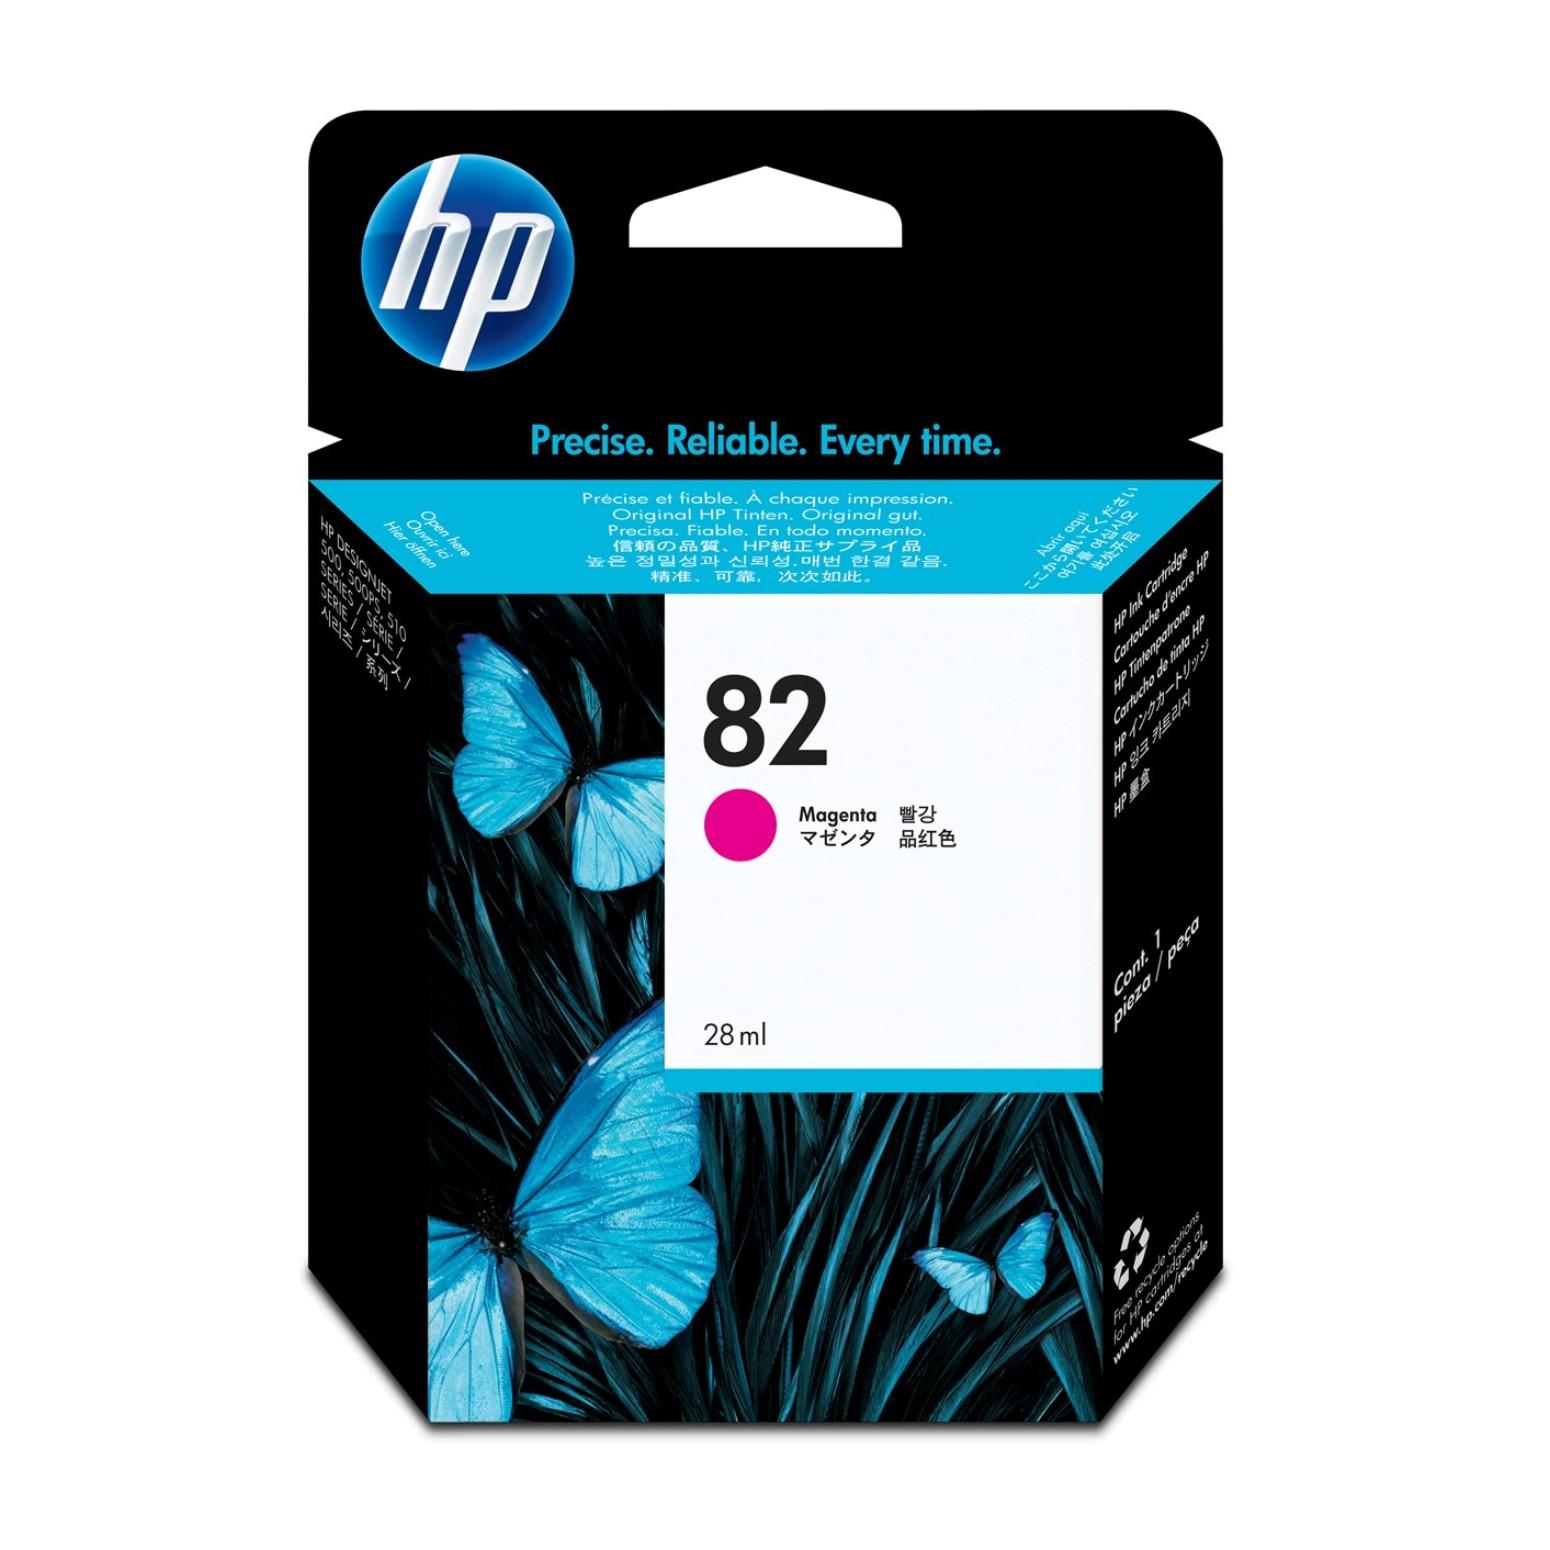 HP 82 28 ml Magenta DesignJet Ink Cartridge, Magenta, HP, Designjet 500/500 Plus/500PS/510, CH567A, Inkjet, 28 ml